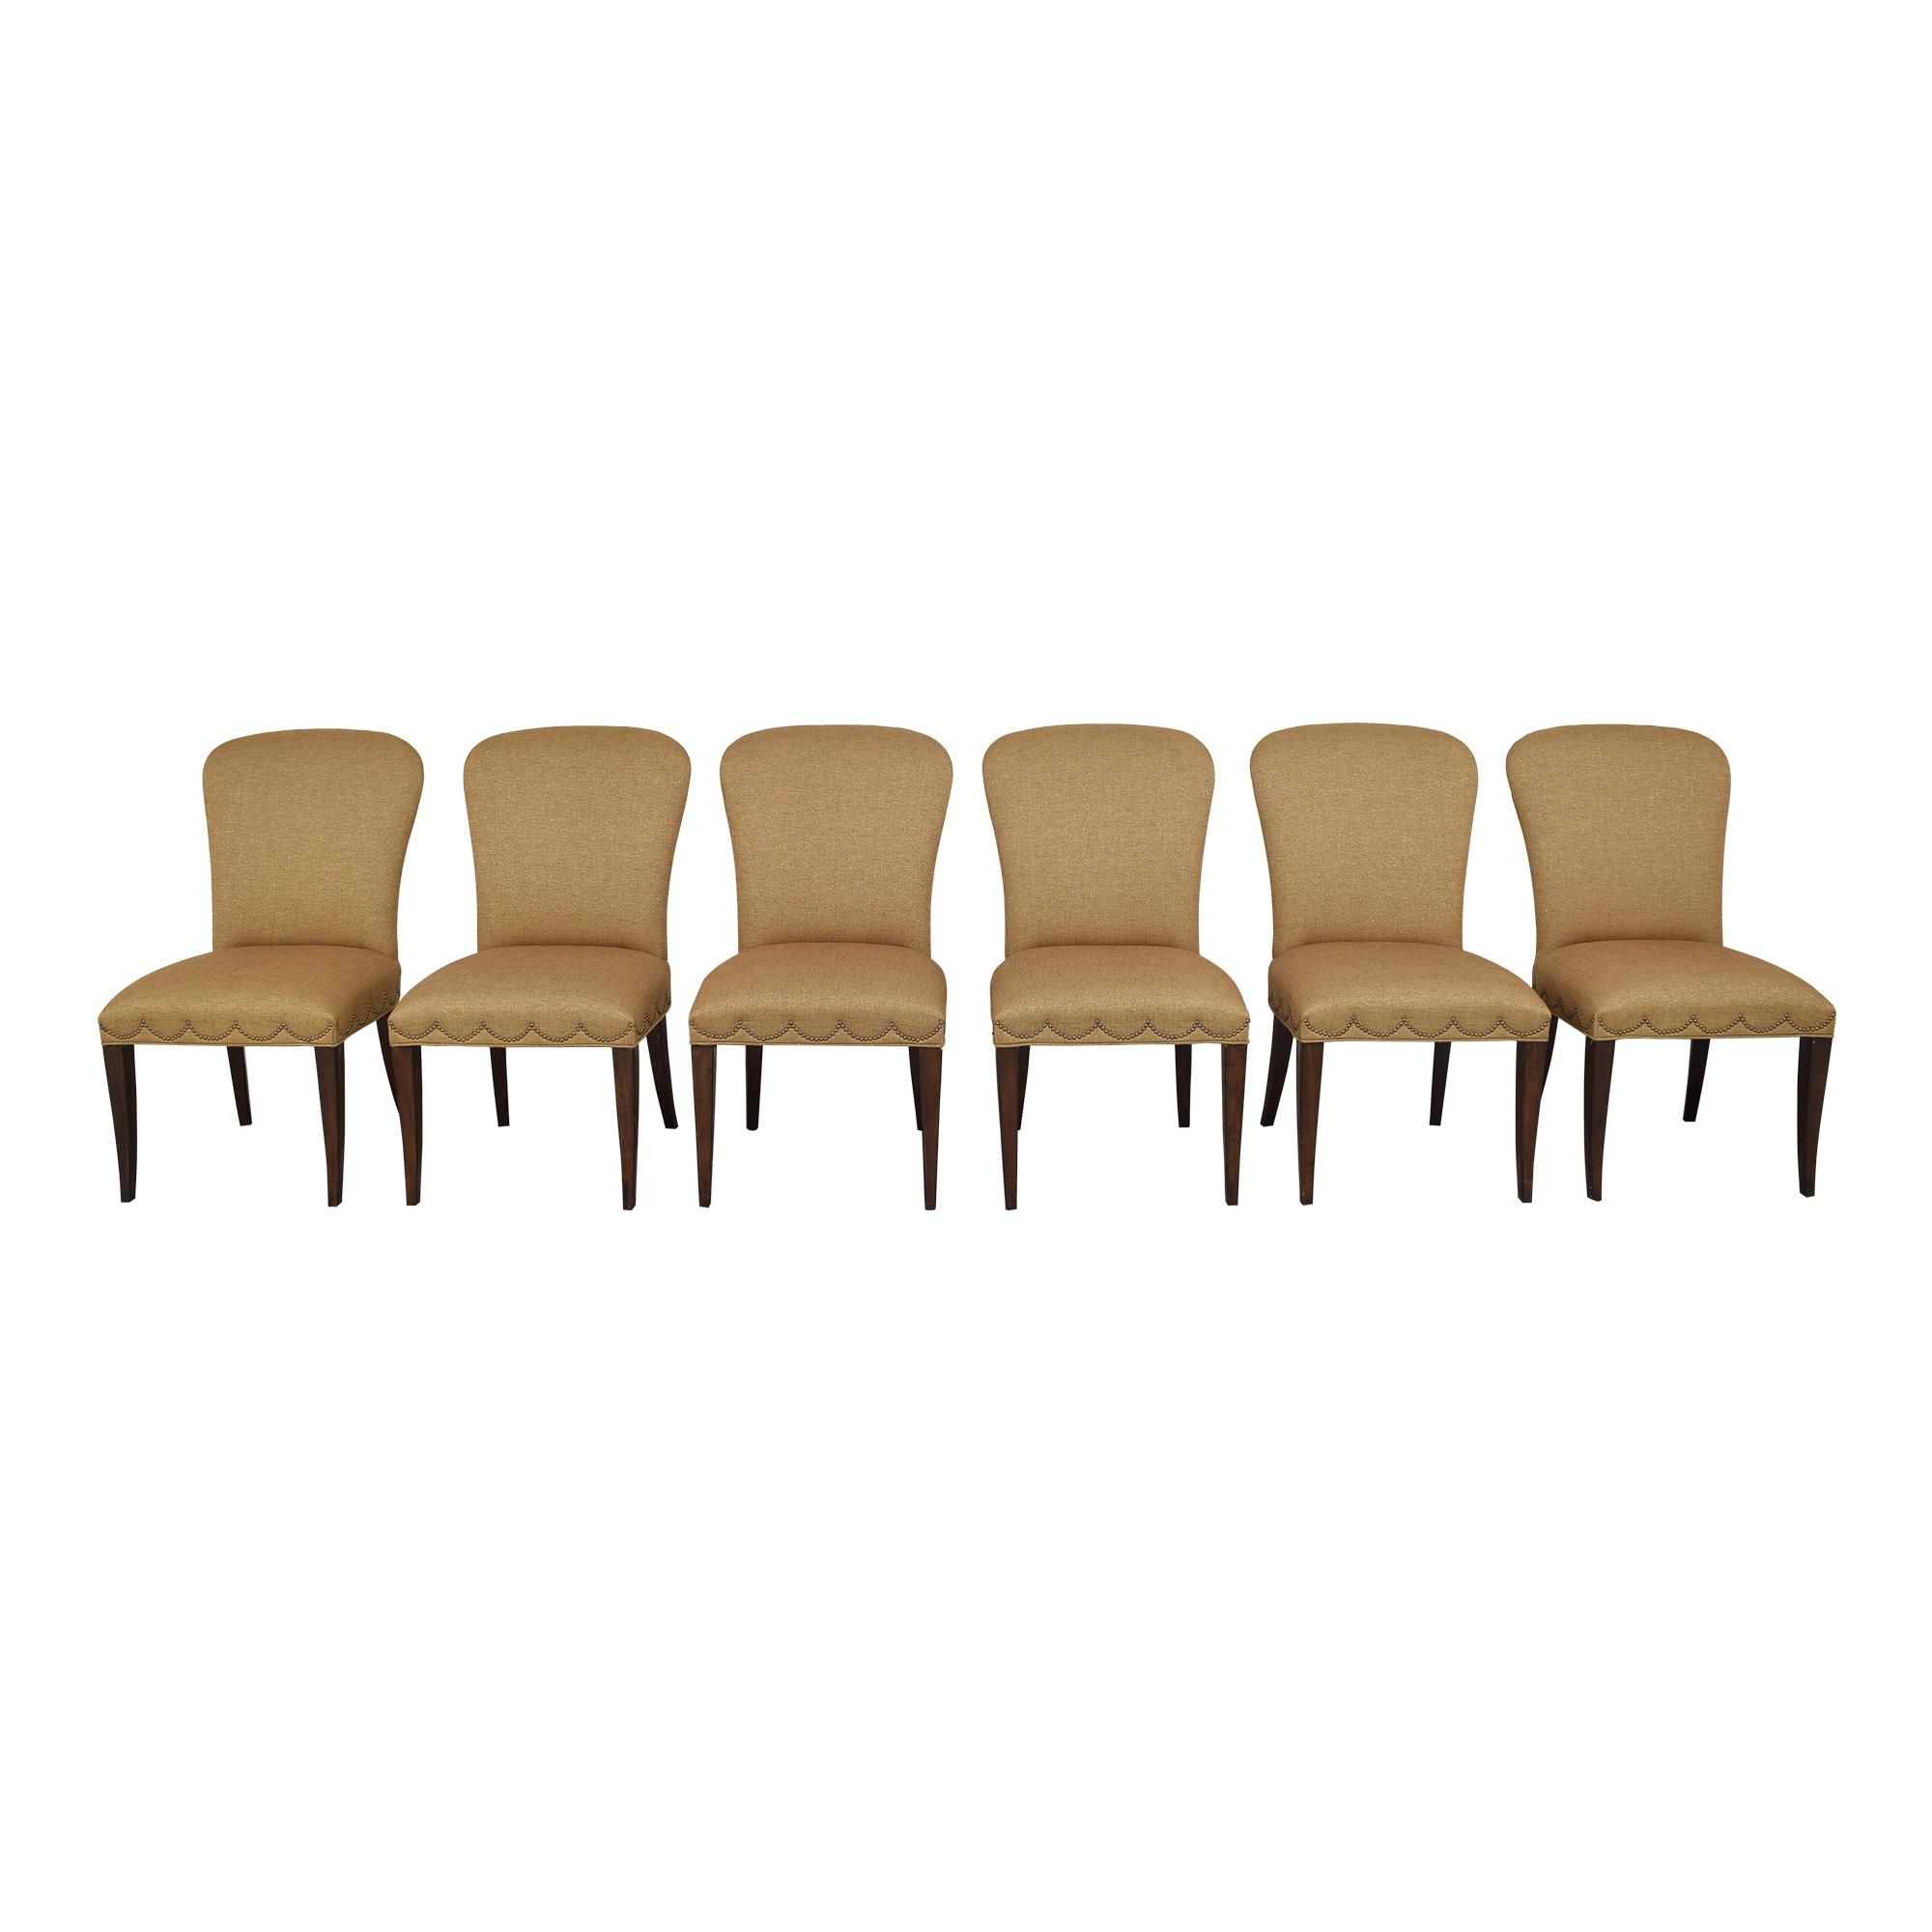 Furniture Brands International Furniture Brands International Scalloped Nailhead Dining Chairs price